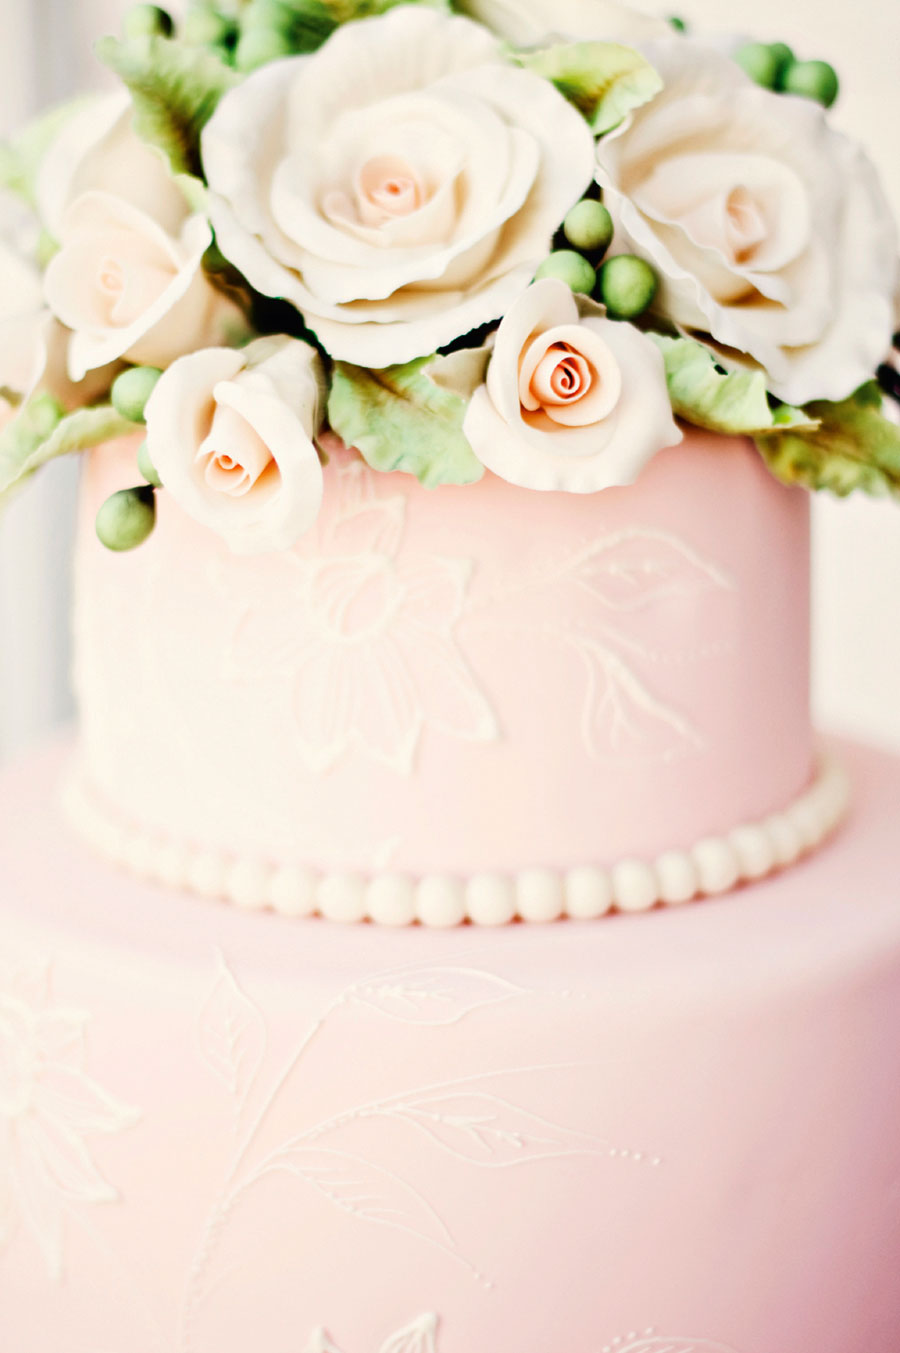 pink-cake-Trista-Weibell-iStock_000010677612Medium